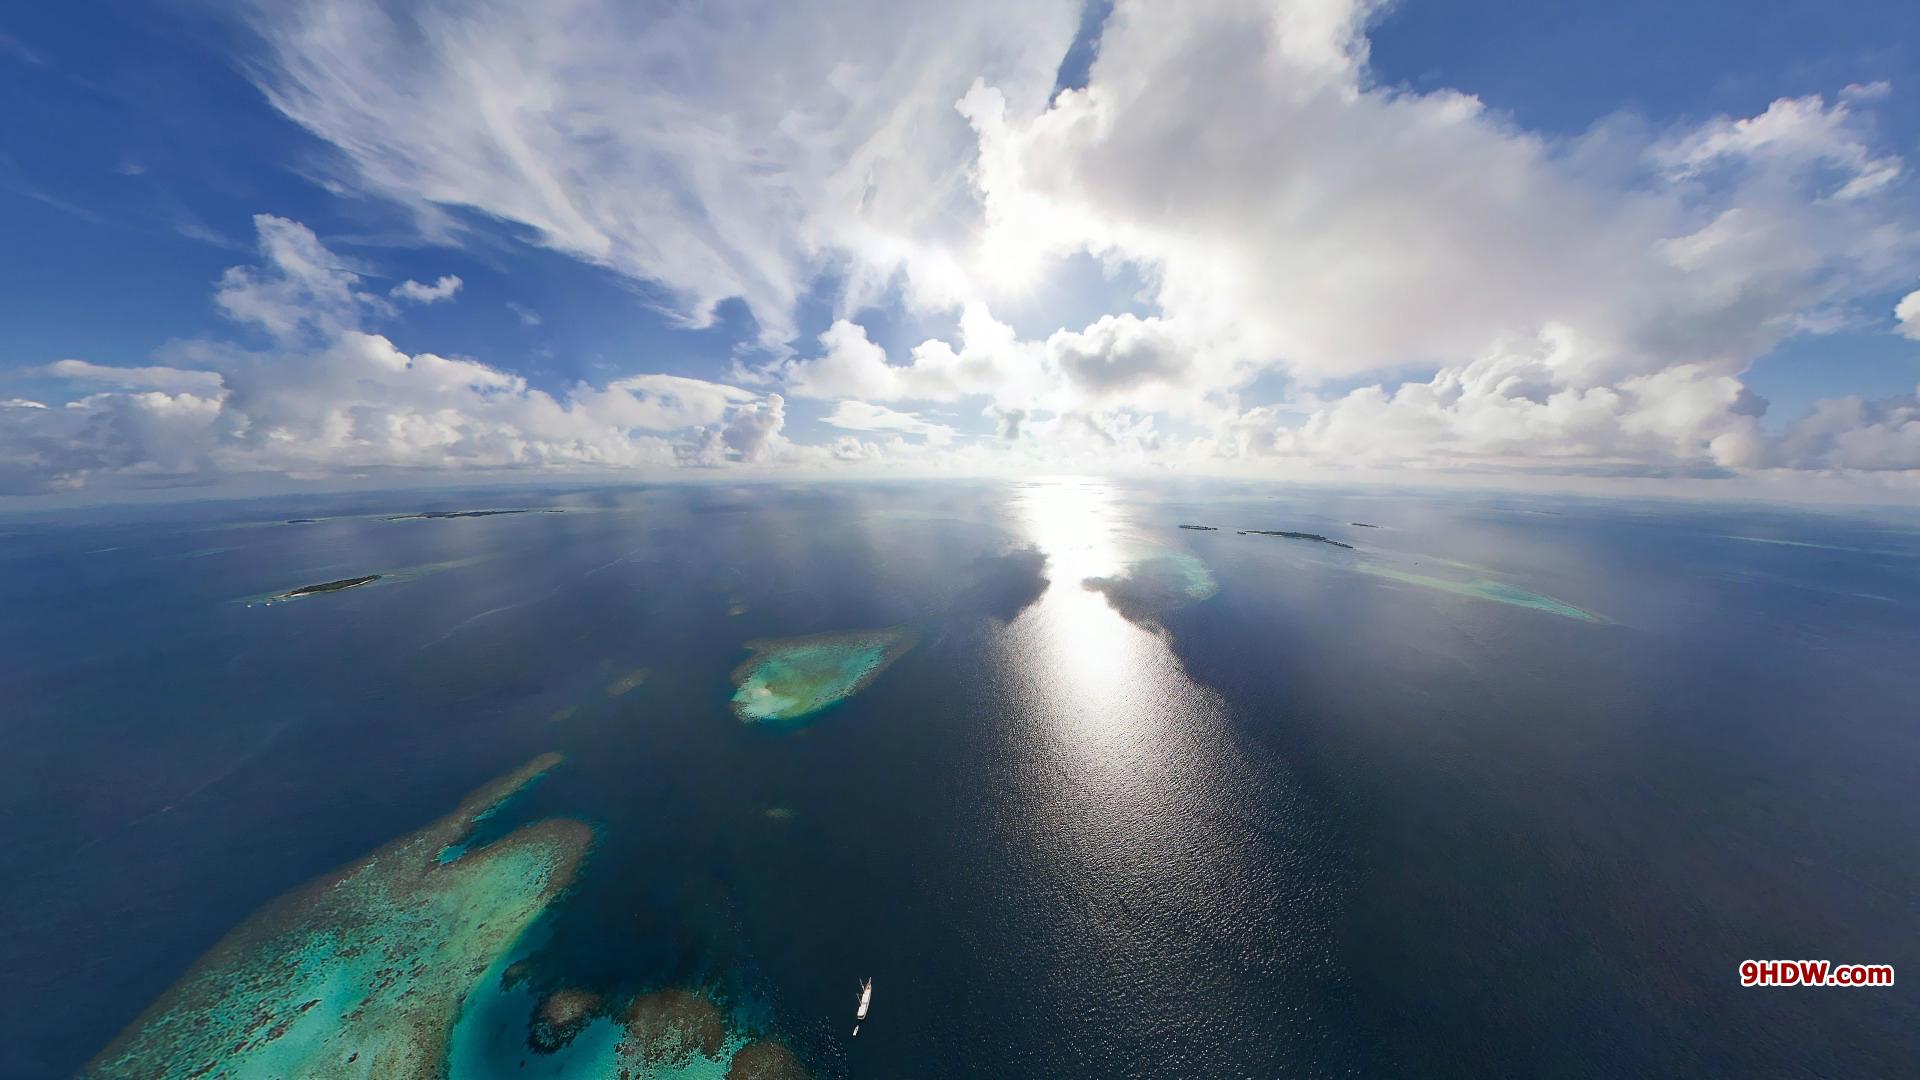 Ocean Sunny Sky Wallpaper HD 1920x1080 2557 1920x1080